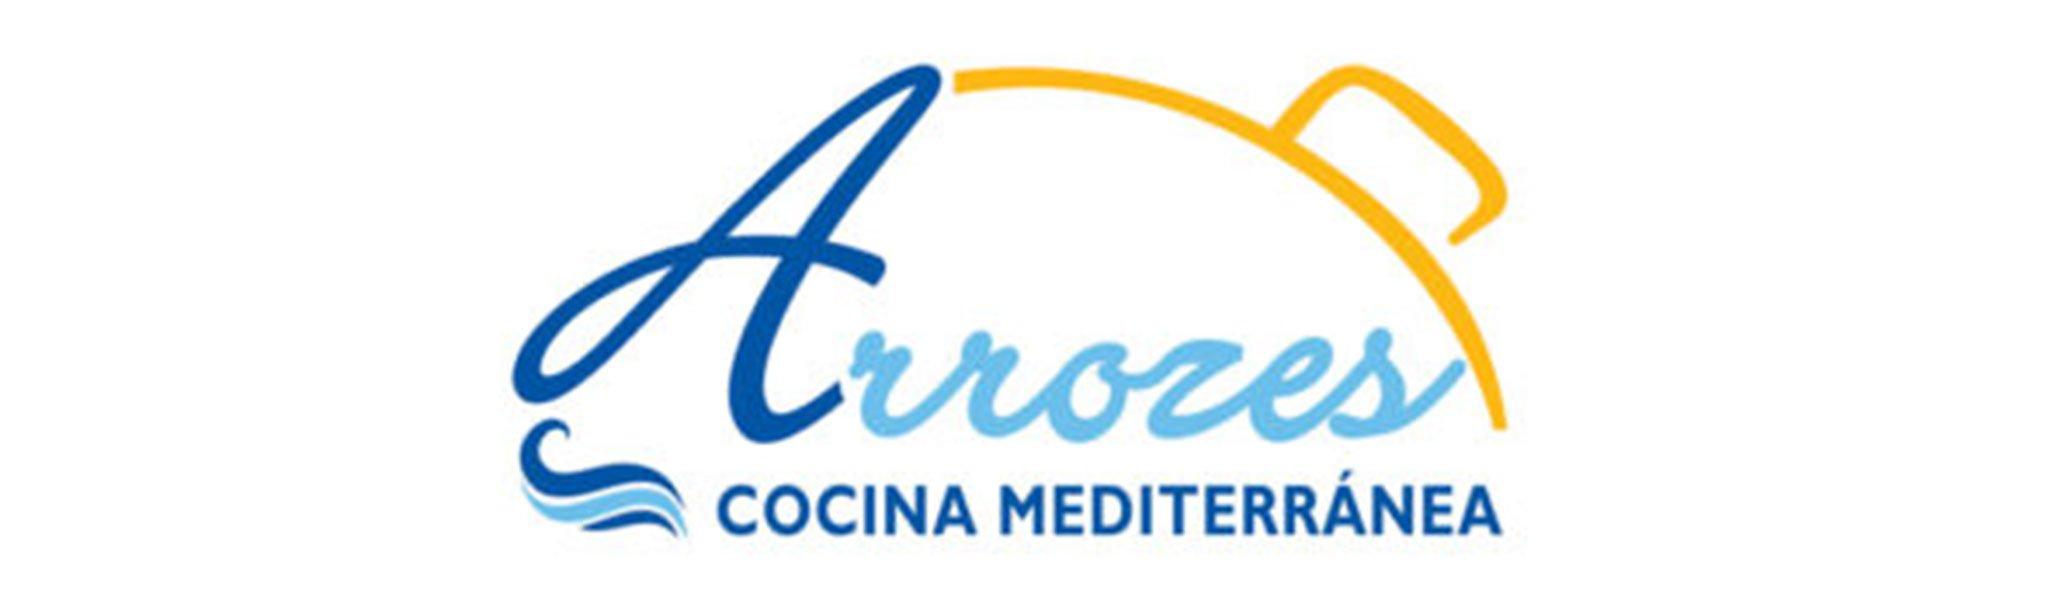 Logotipo de Arrozes